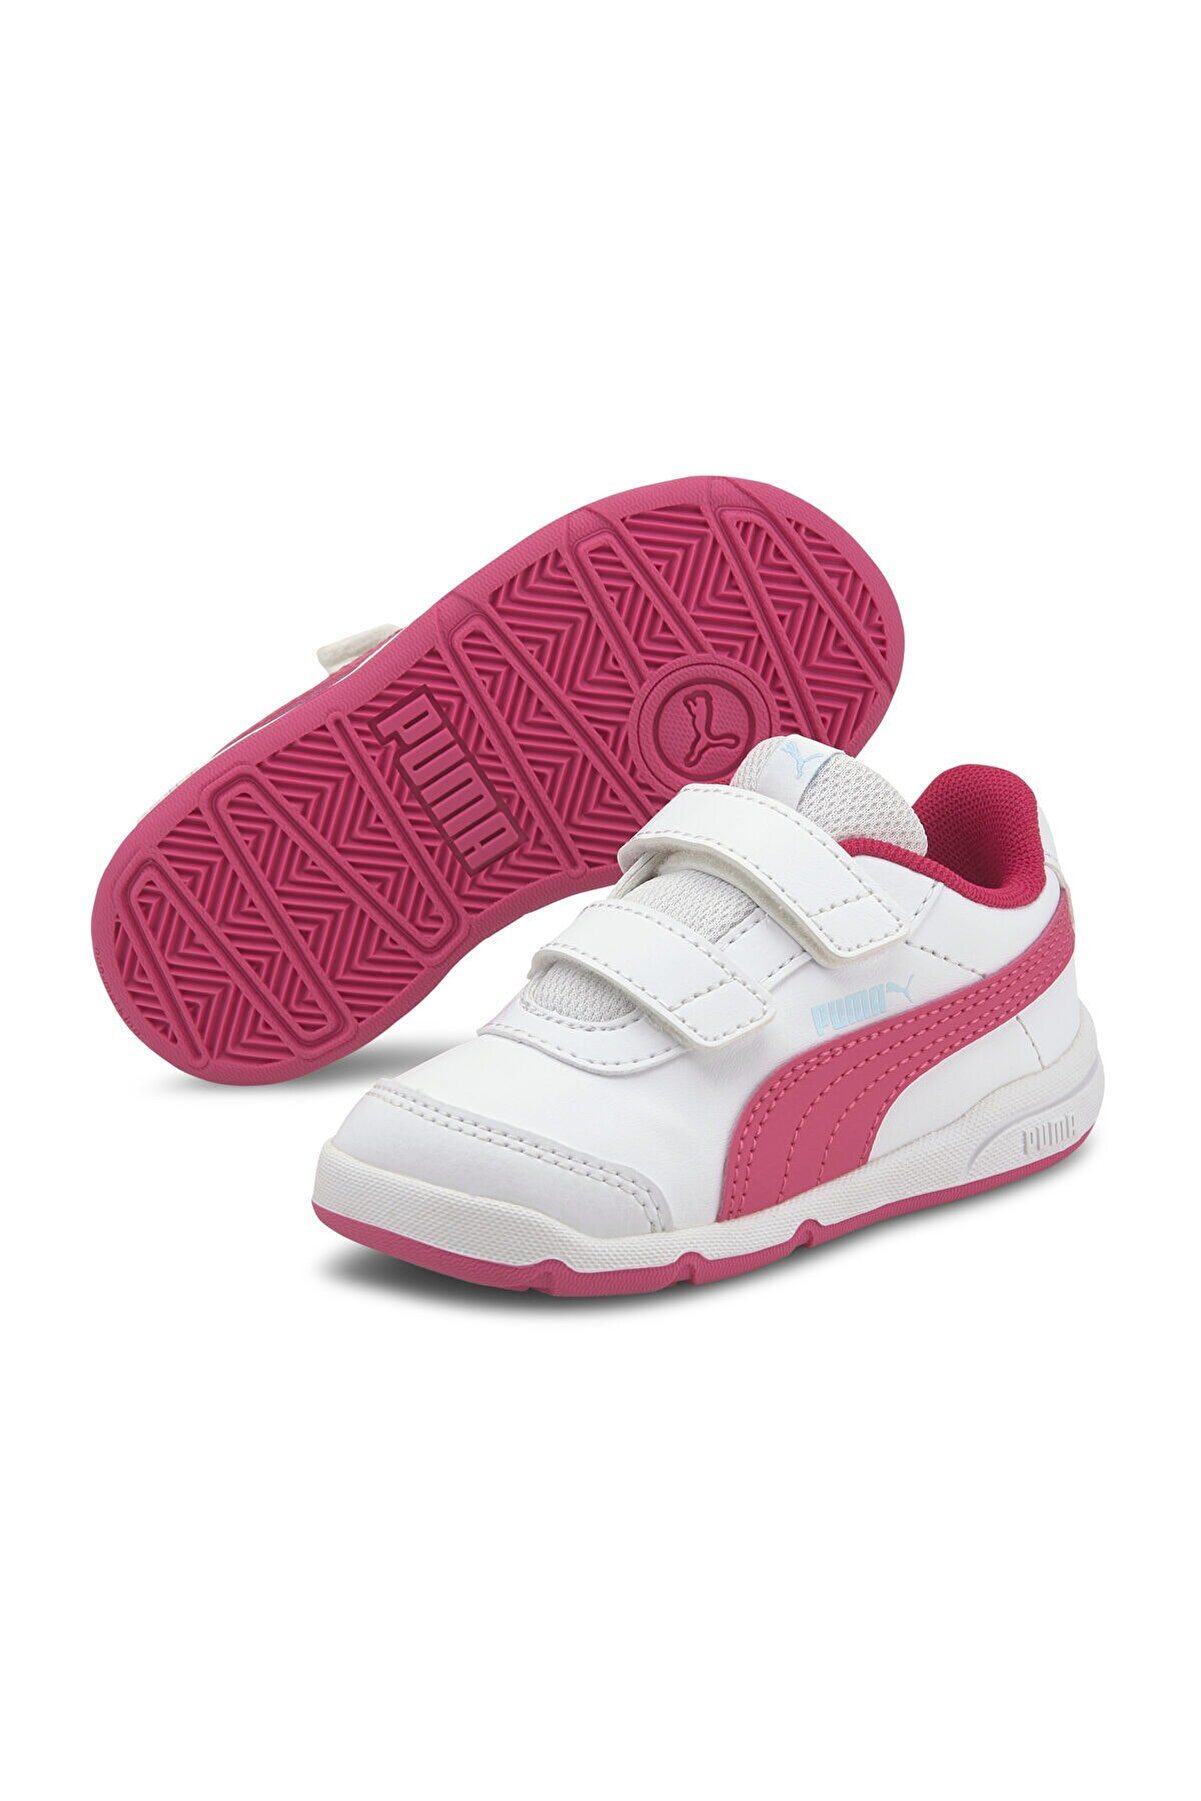 Puma Unisex Sneaker - STEPFLEEX 2 SL VE V - 19252318